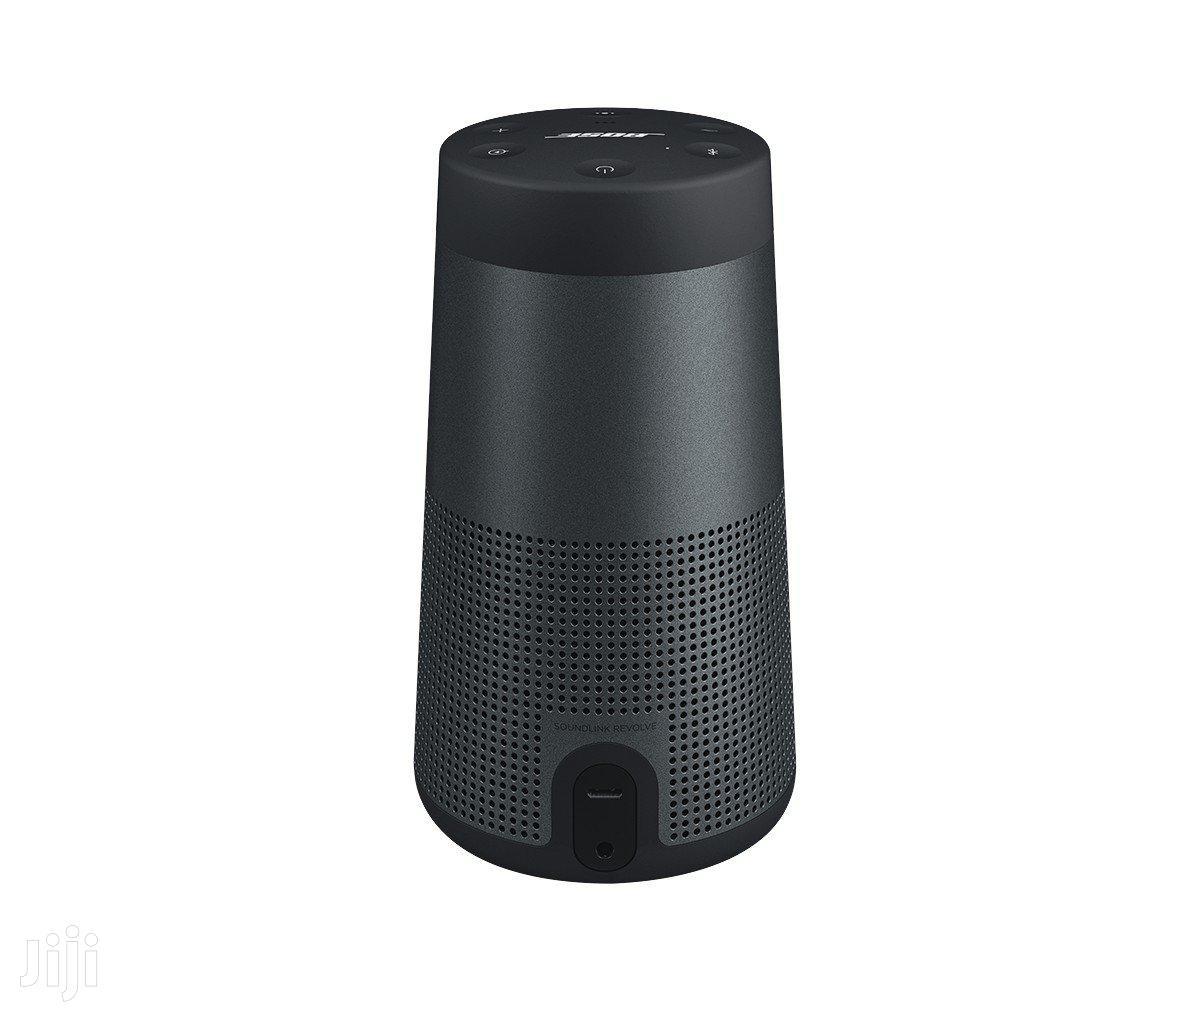 Bose Soundlink Revolve Wireless Speaker - Black | Audio & Music Equipment for sale in Ikeja, Lagos State, Nigeria